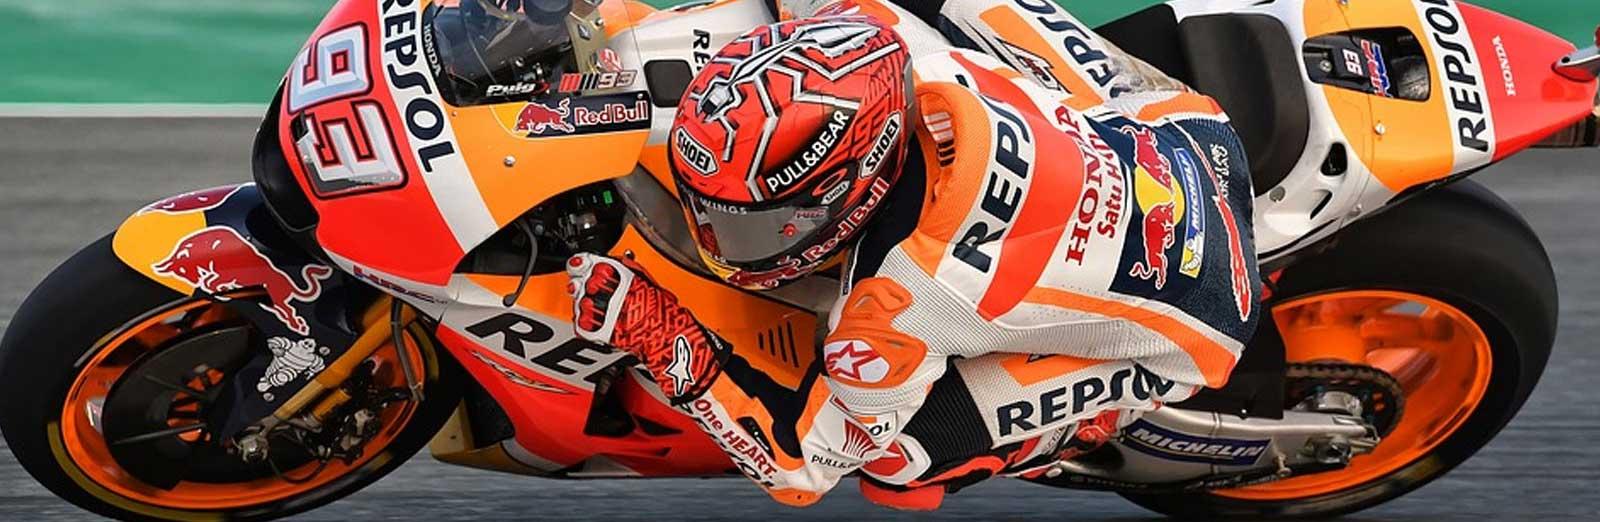 Valencia MotoGP with Grand Prix Tours.